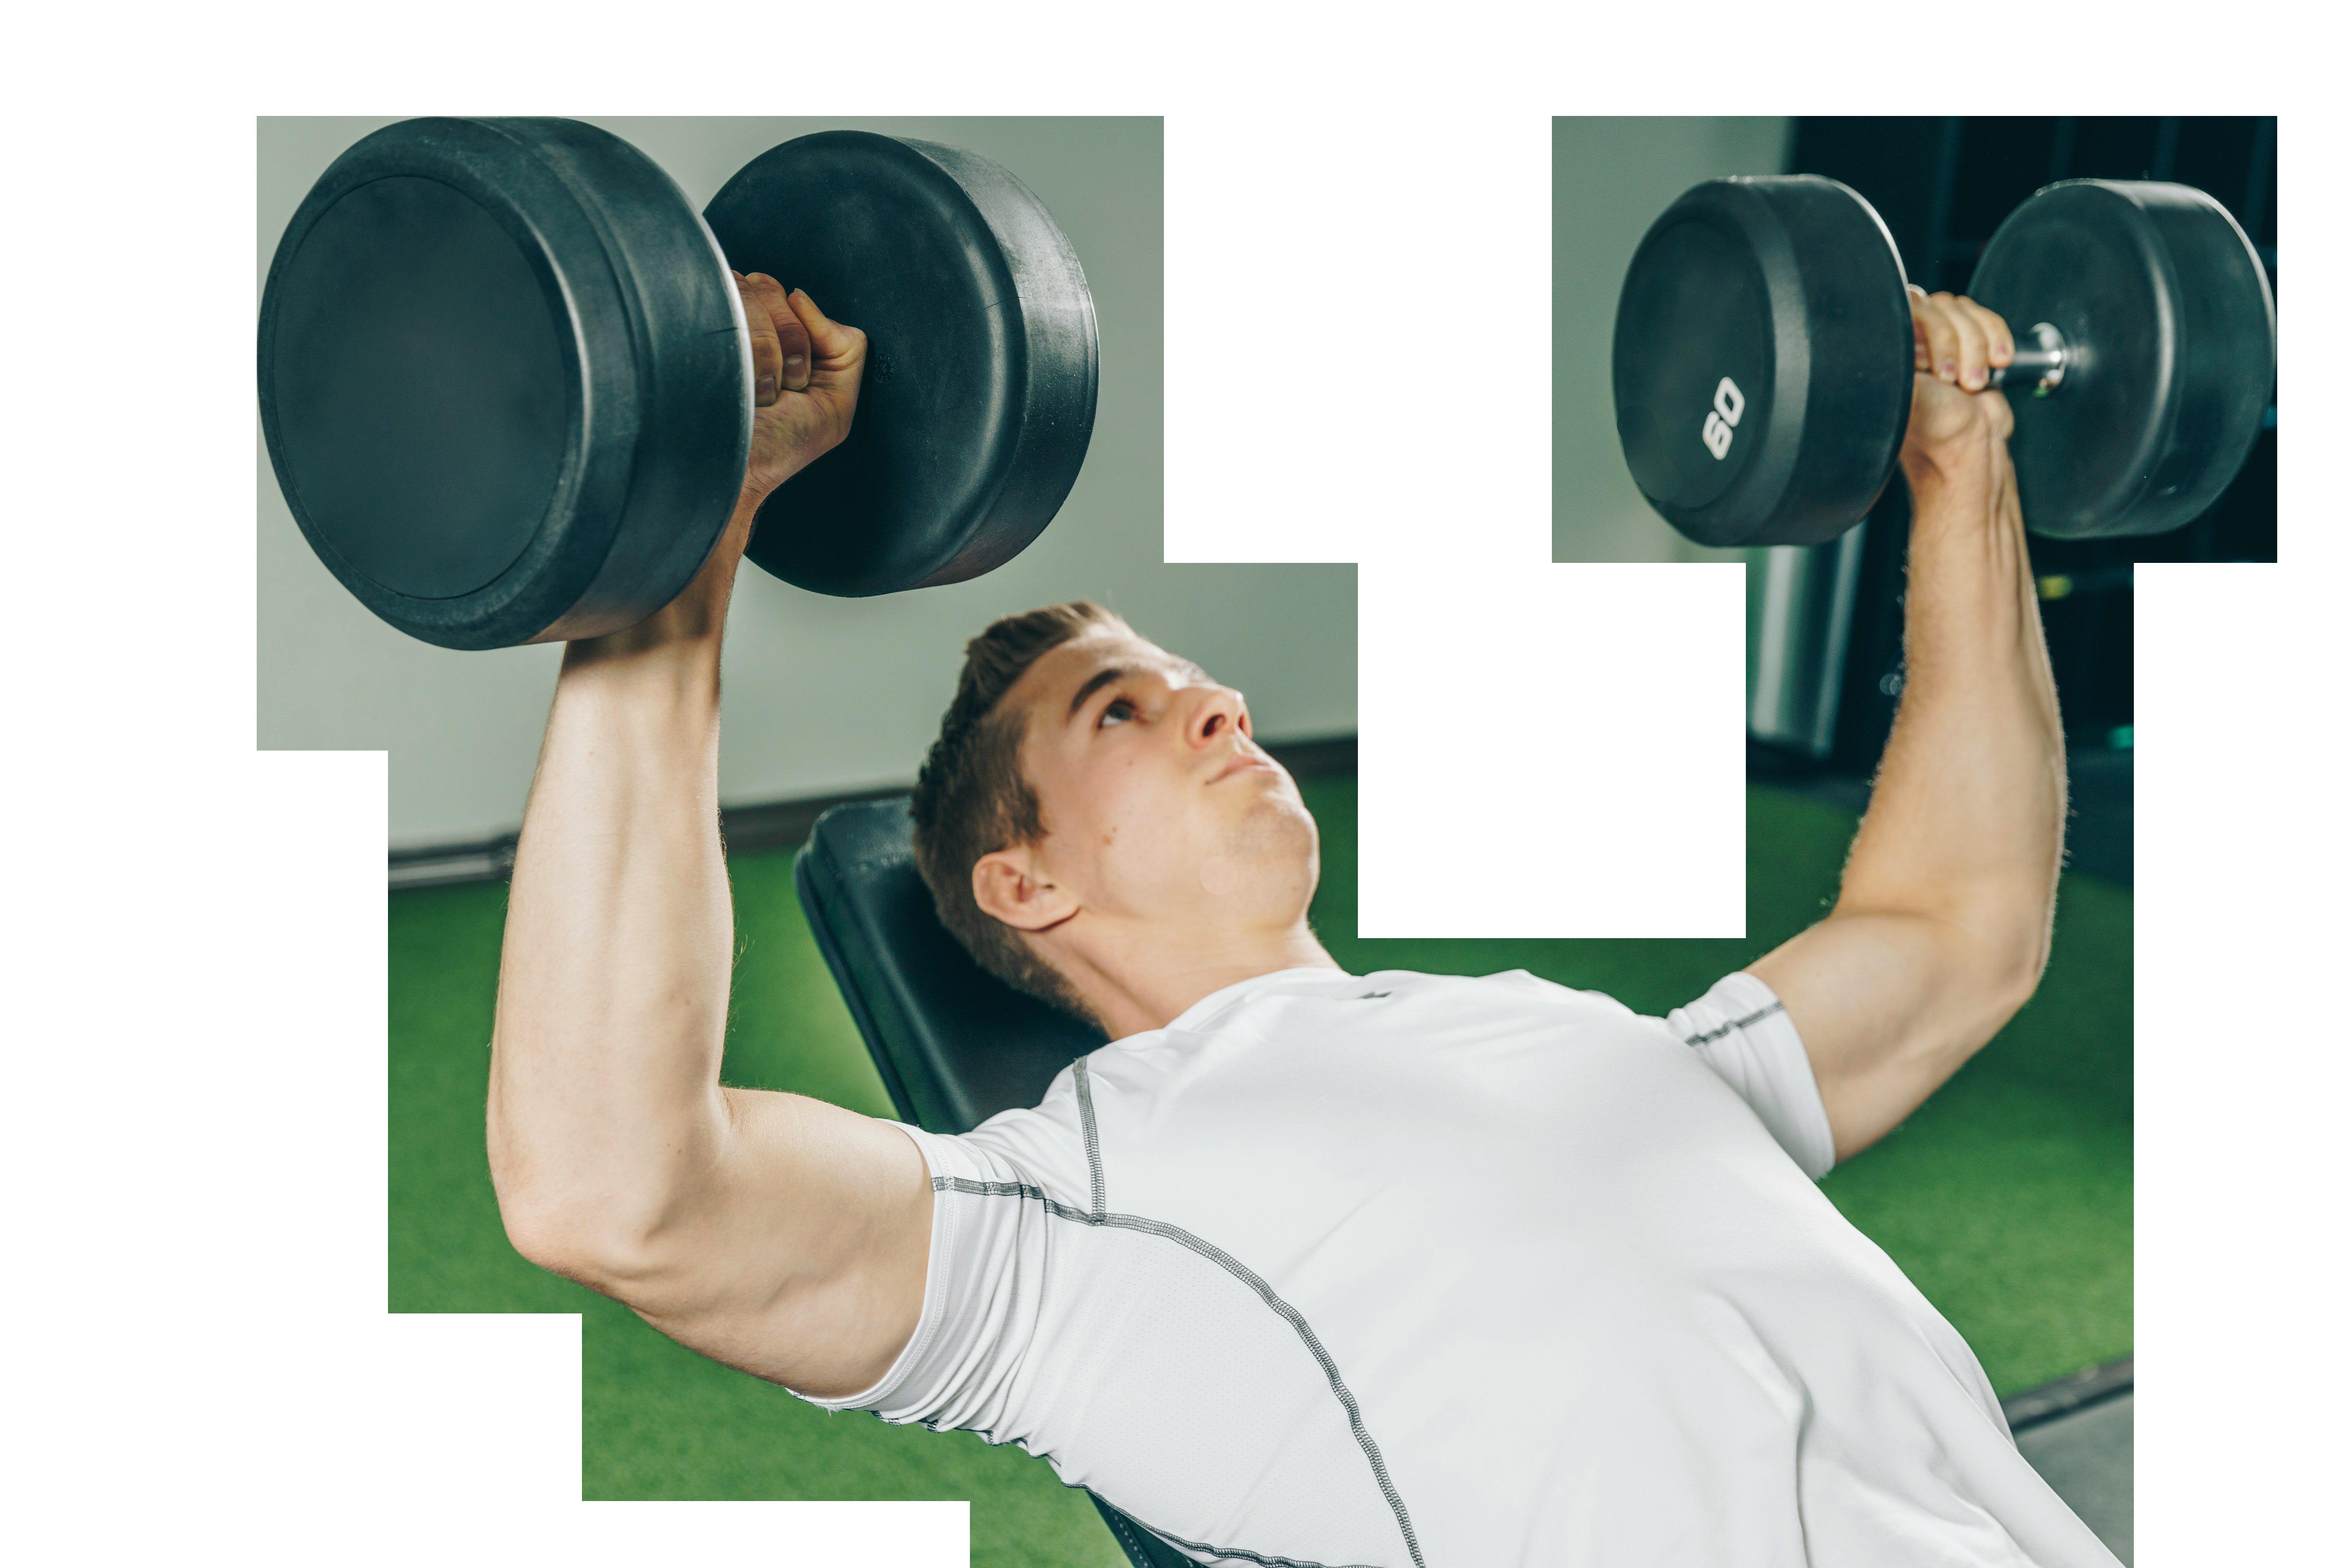 Gym Workout Men PNG Image Free Download serachpng.com.